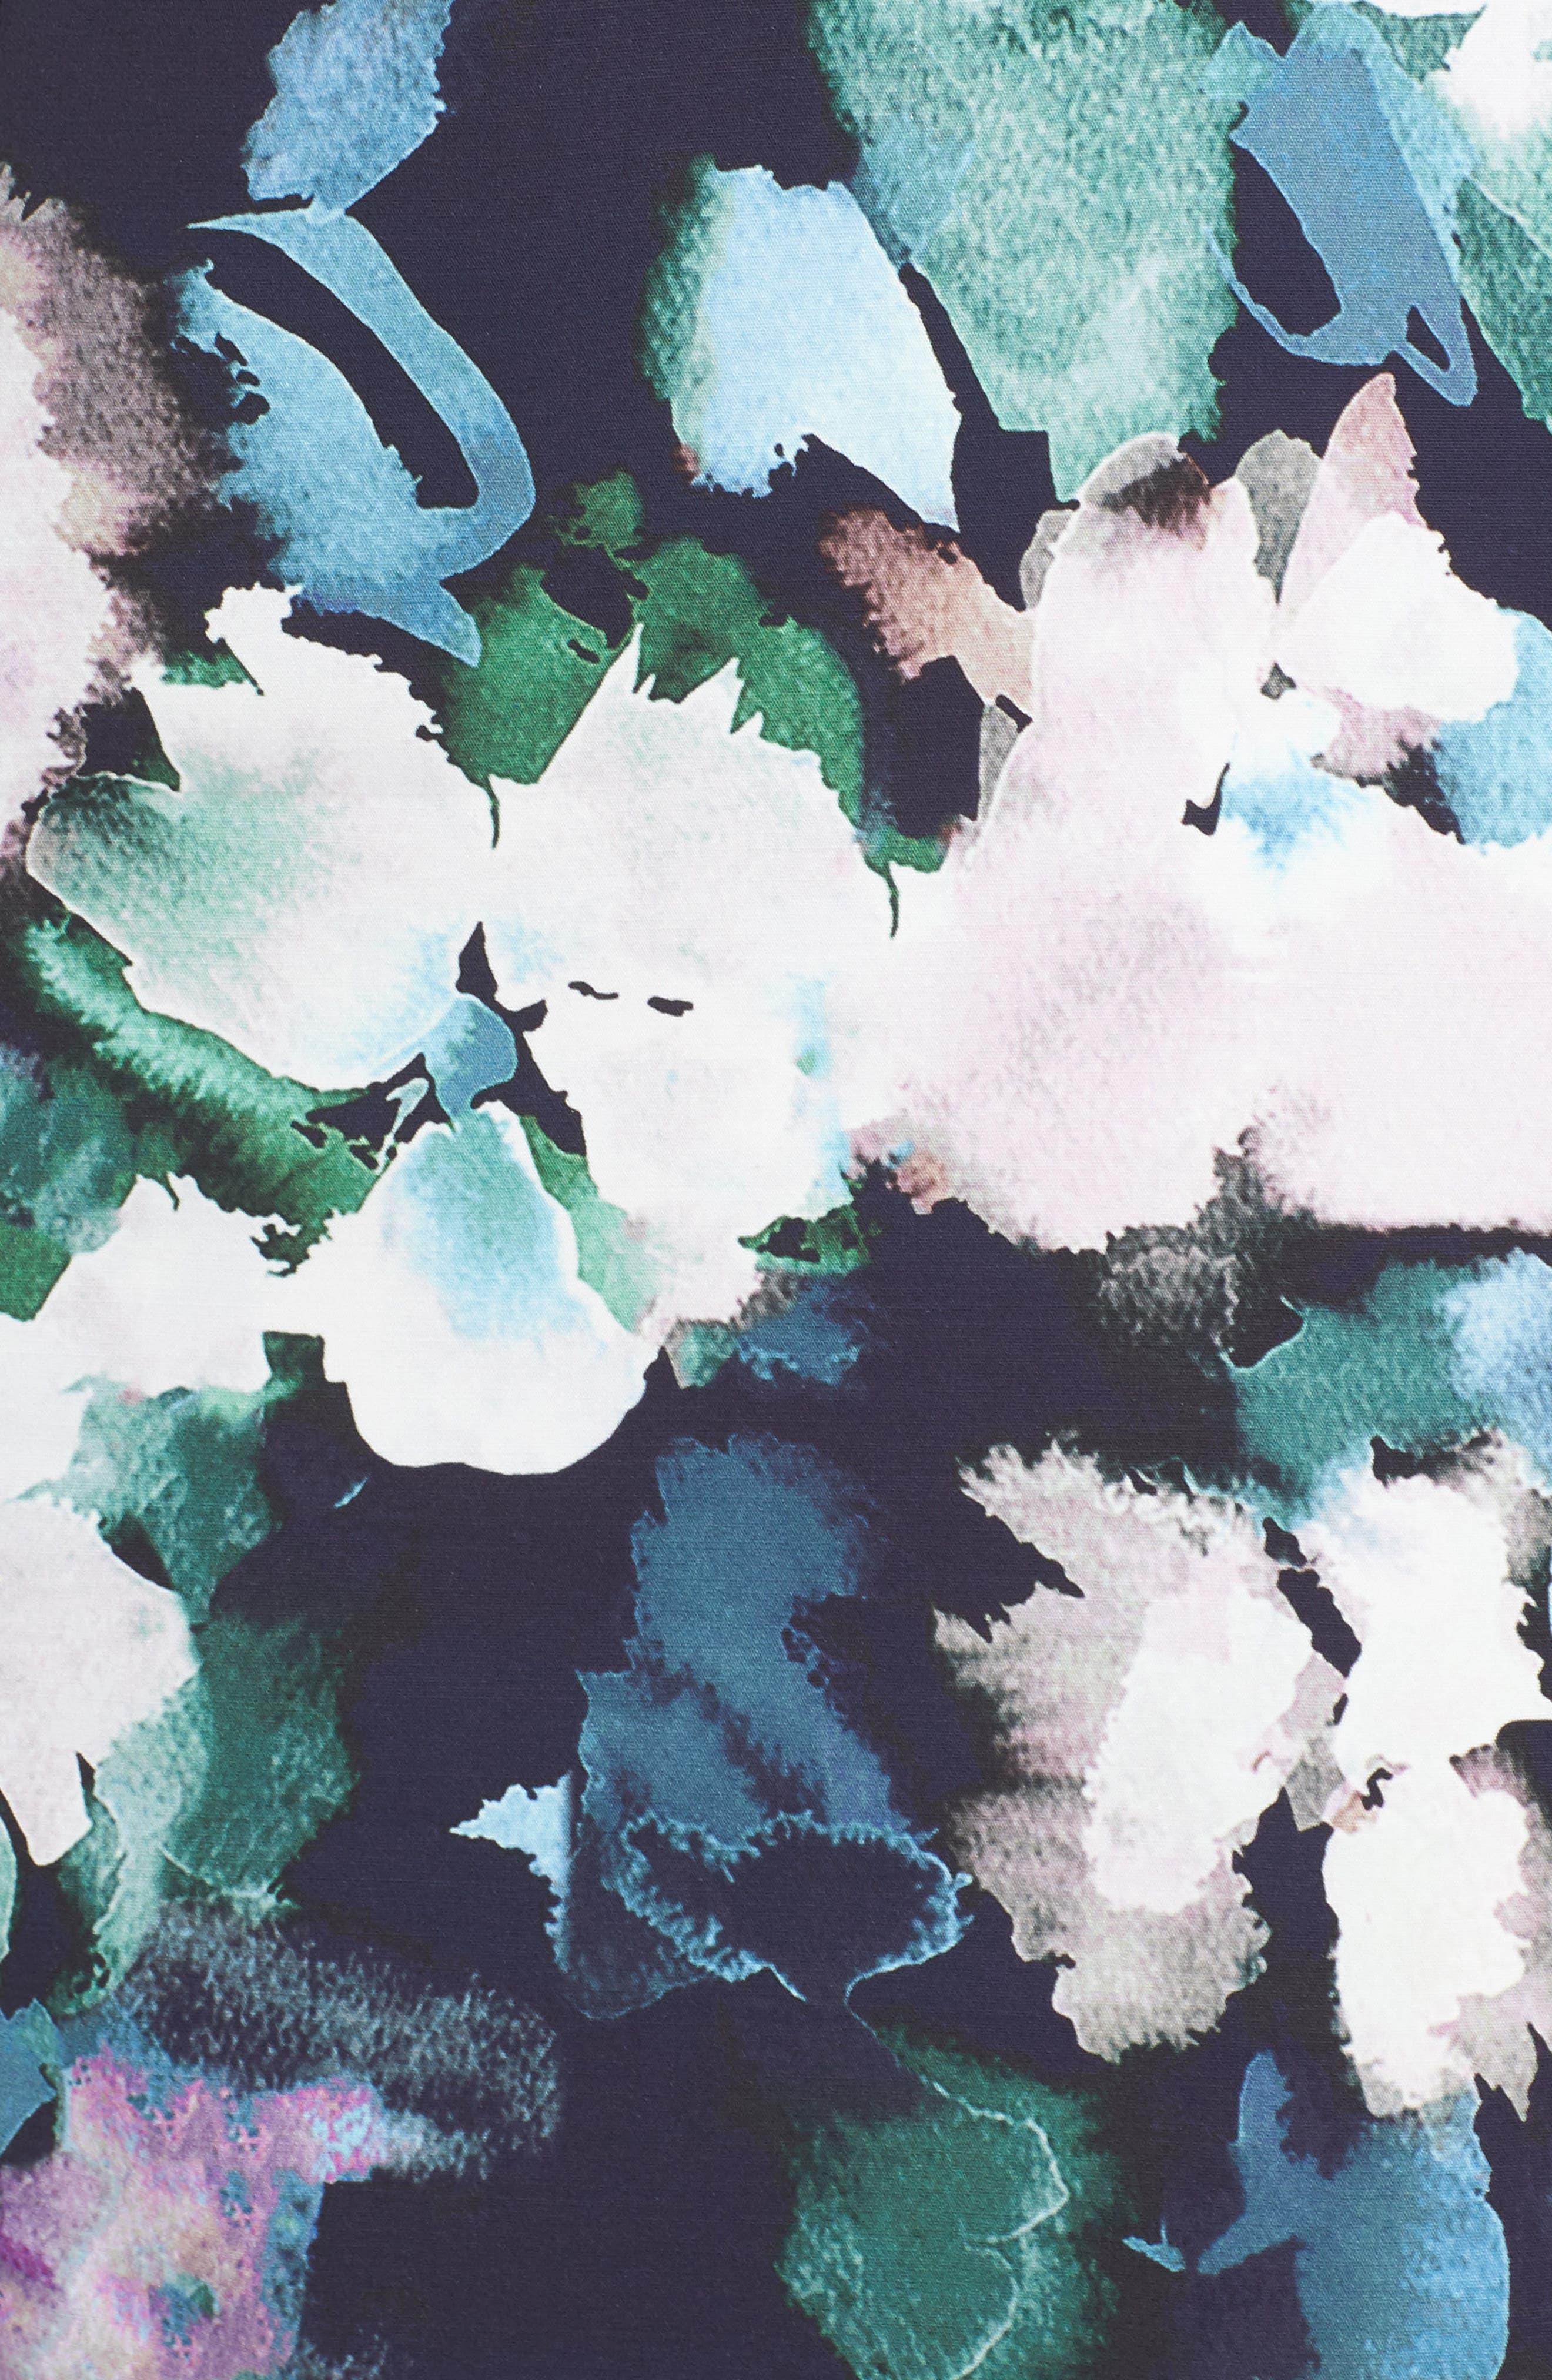 Eleanor Sheath Dress,                             Alternate thumbnail 6, color,                             UTILITY MULTI